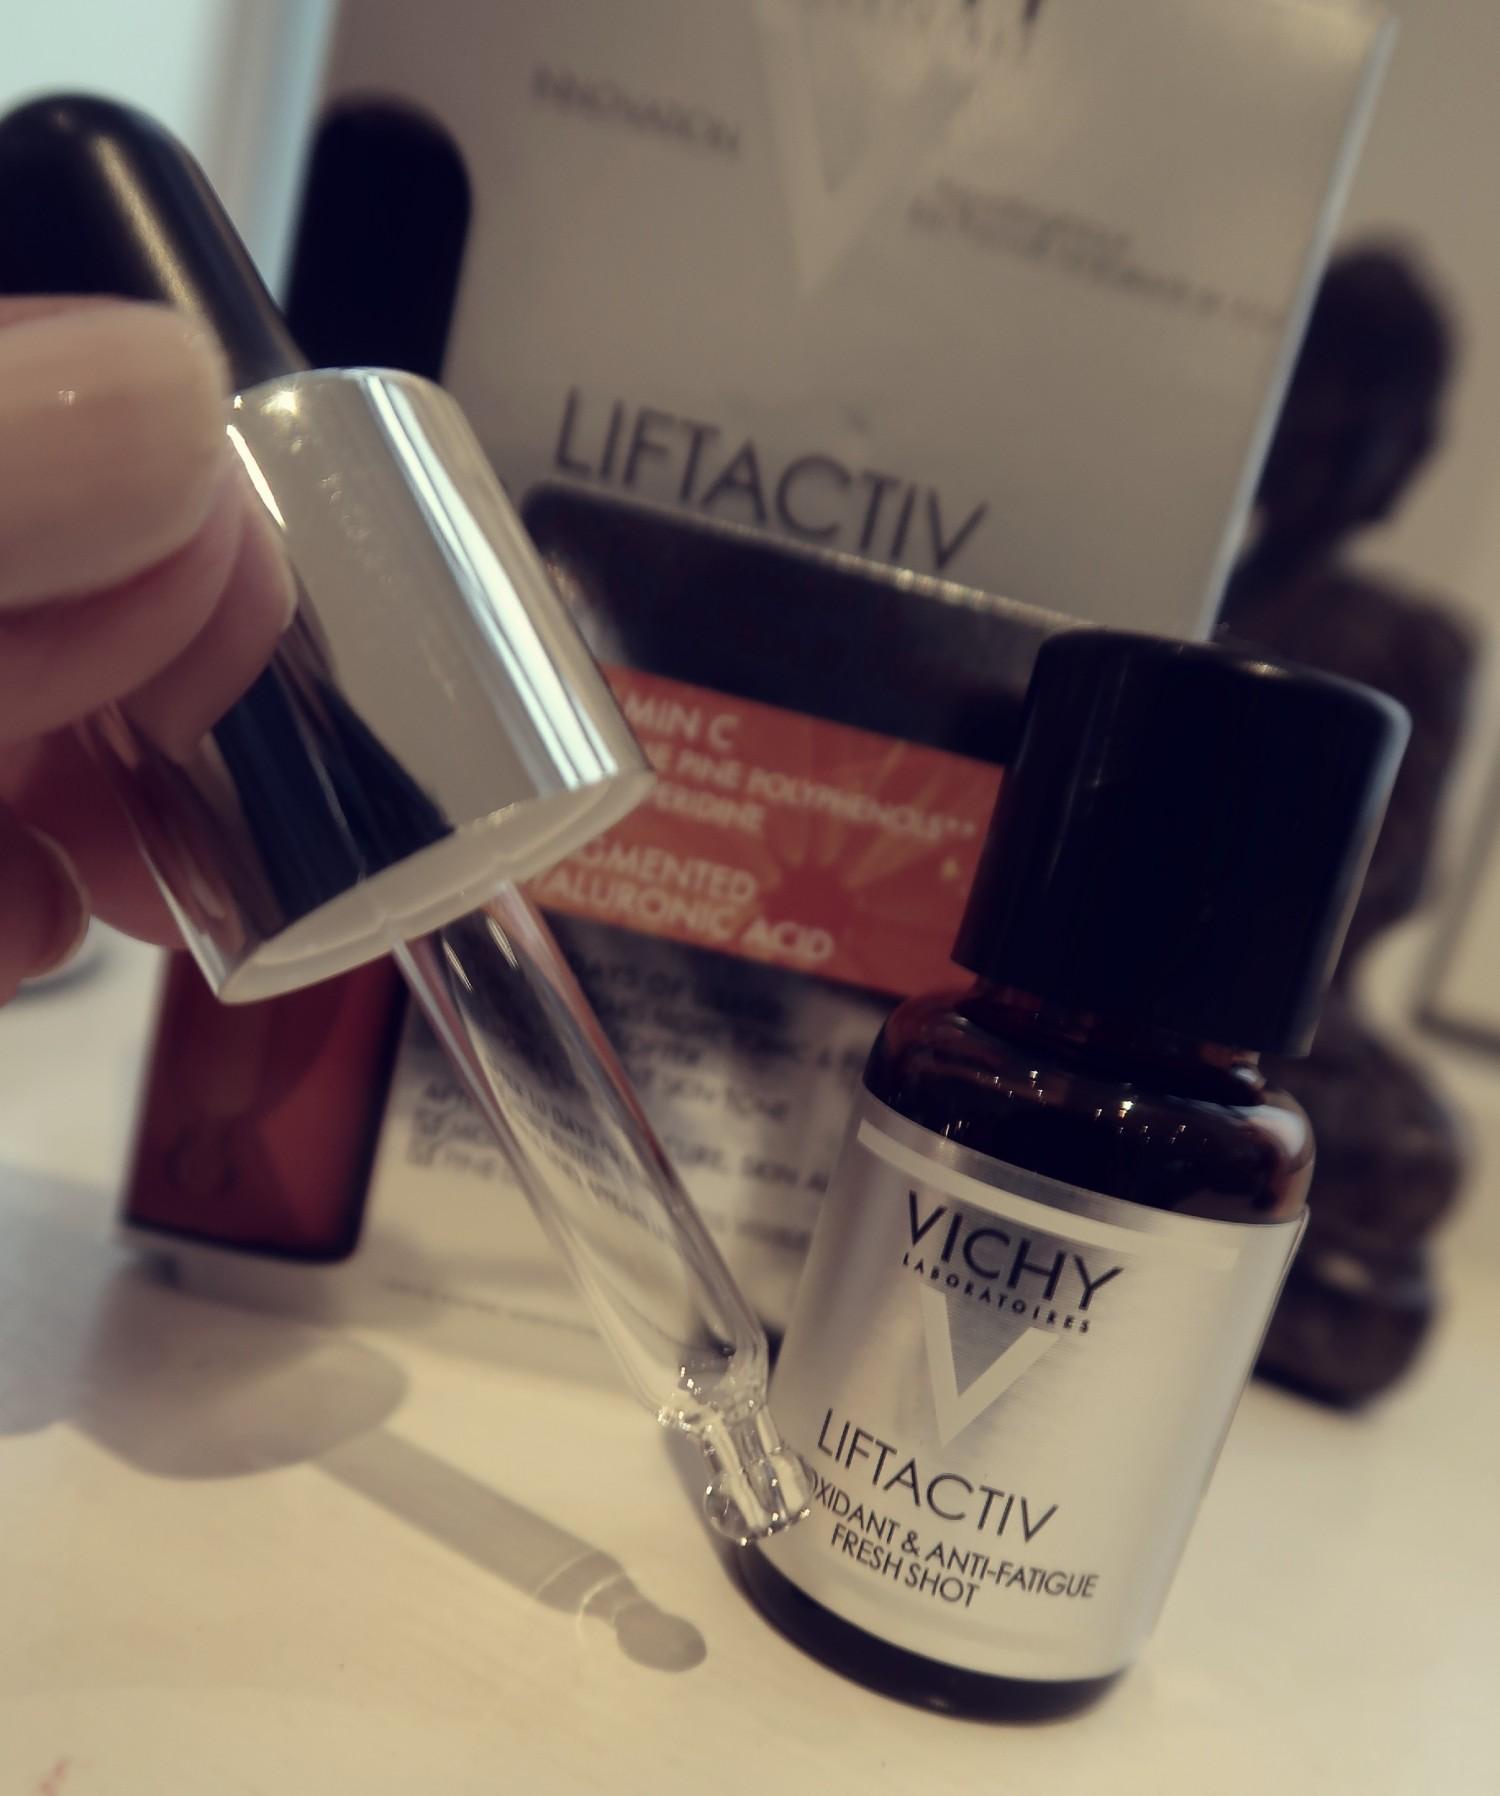 vichy-c-vitamin-kur